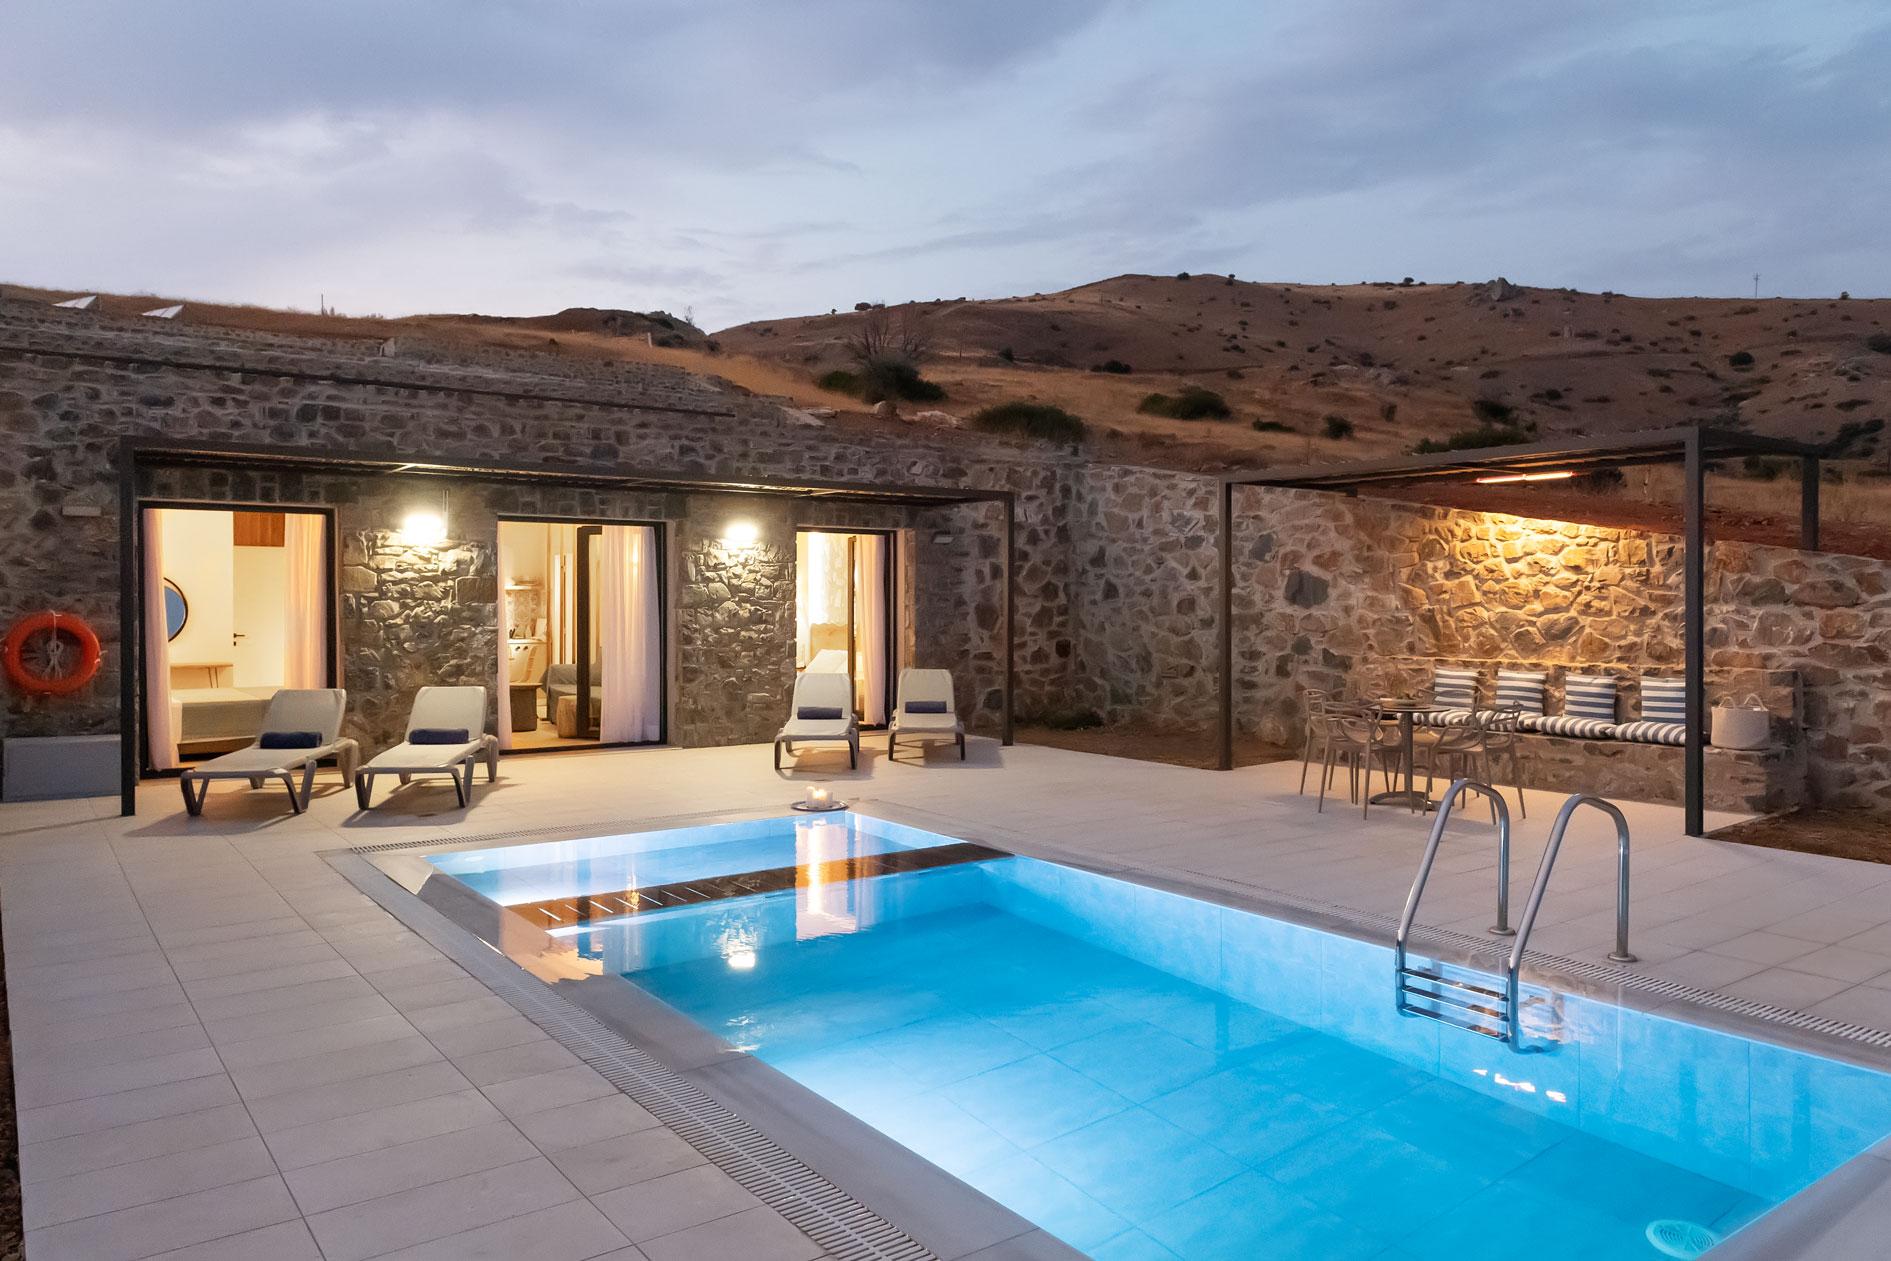 2-bedroom-superior-villa-in-the-evening